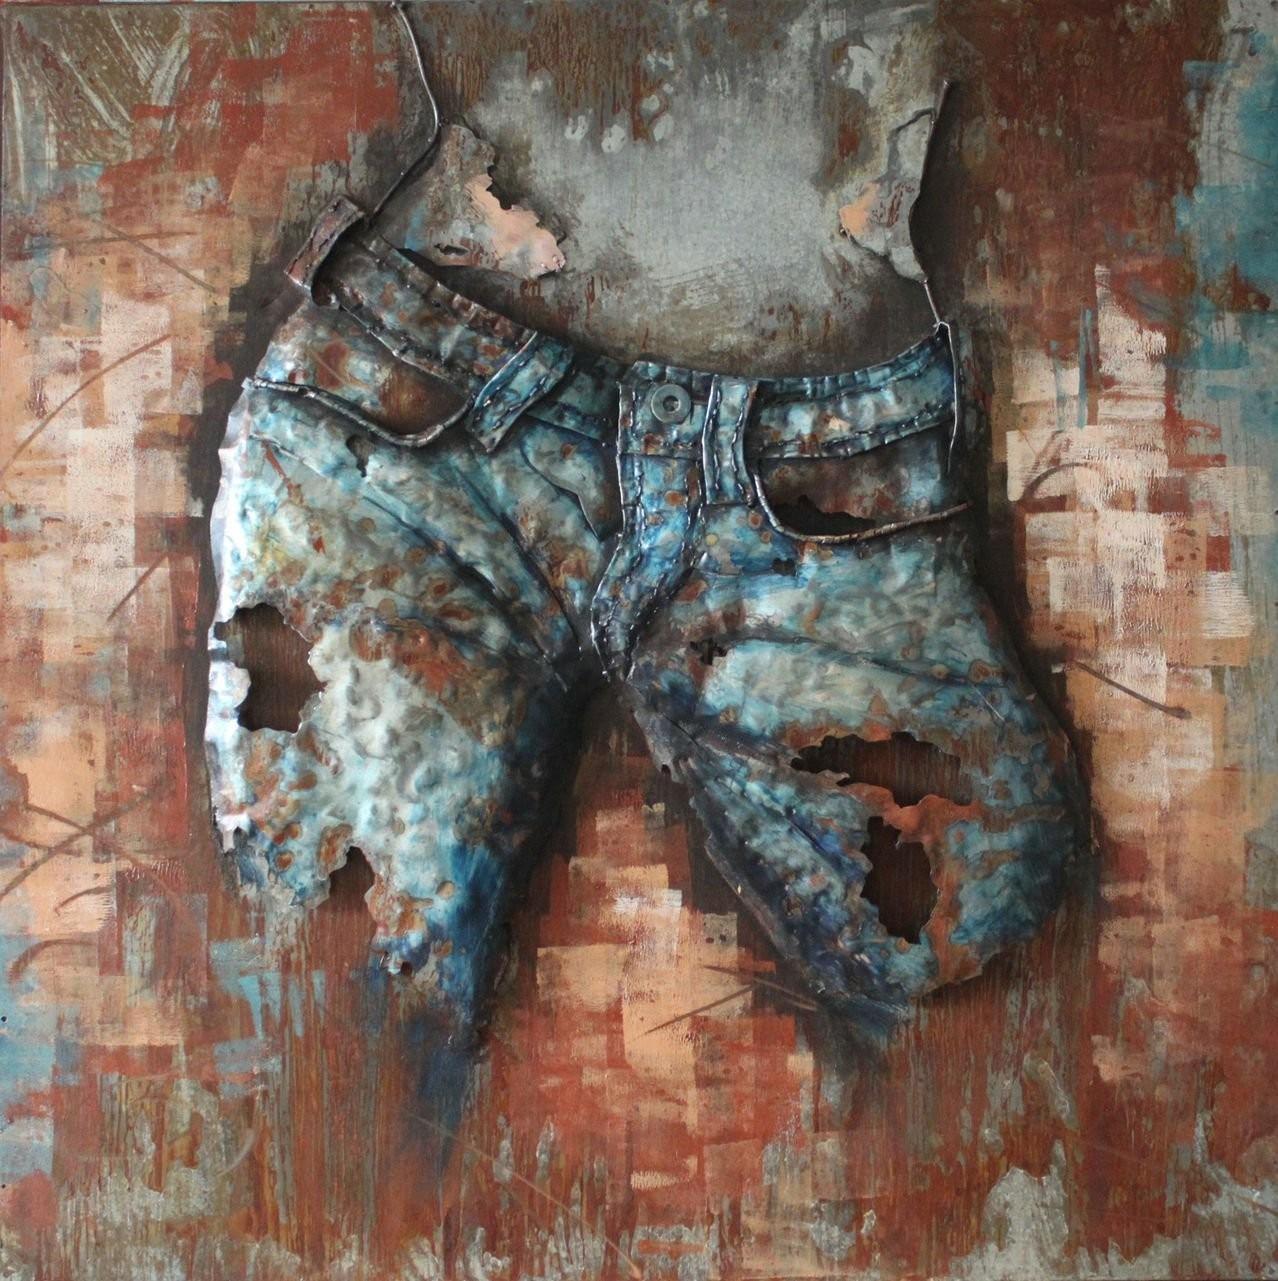 Jeans Cowgirl(Front) - 3D Metal Wall Art inside 3D Metal Wall Art